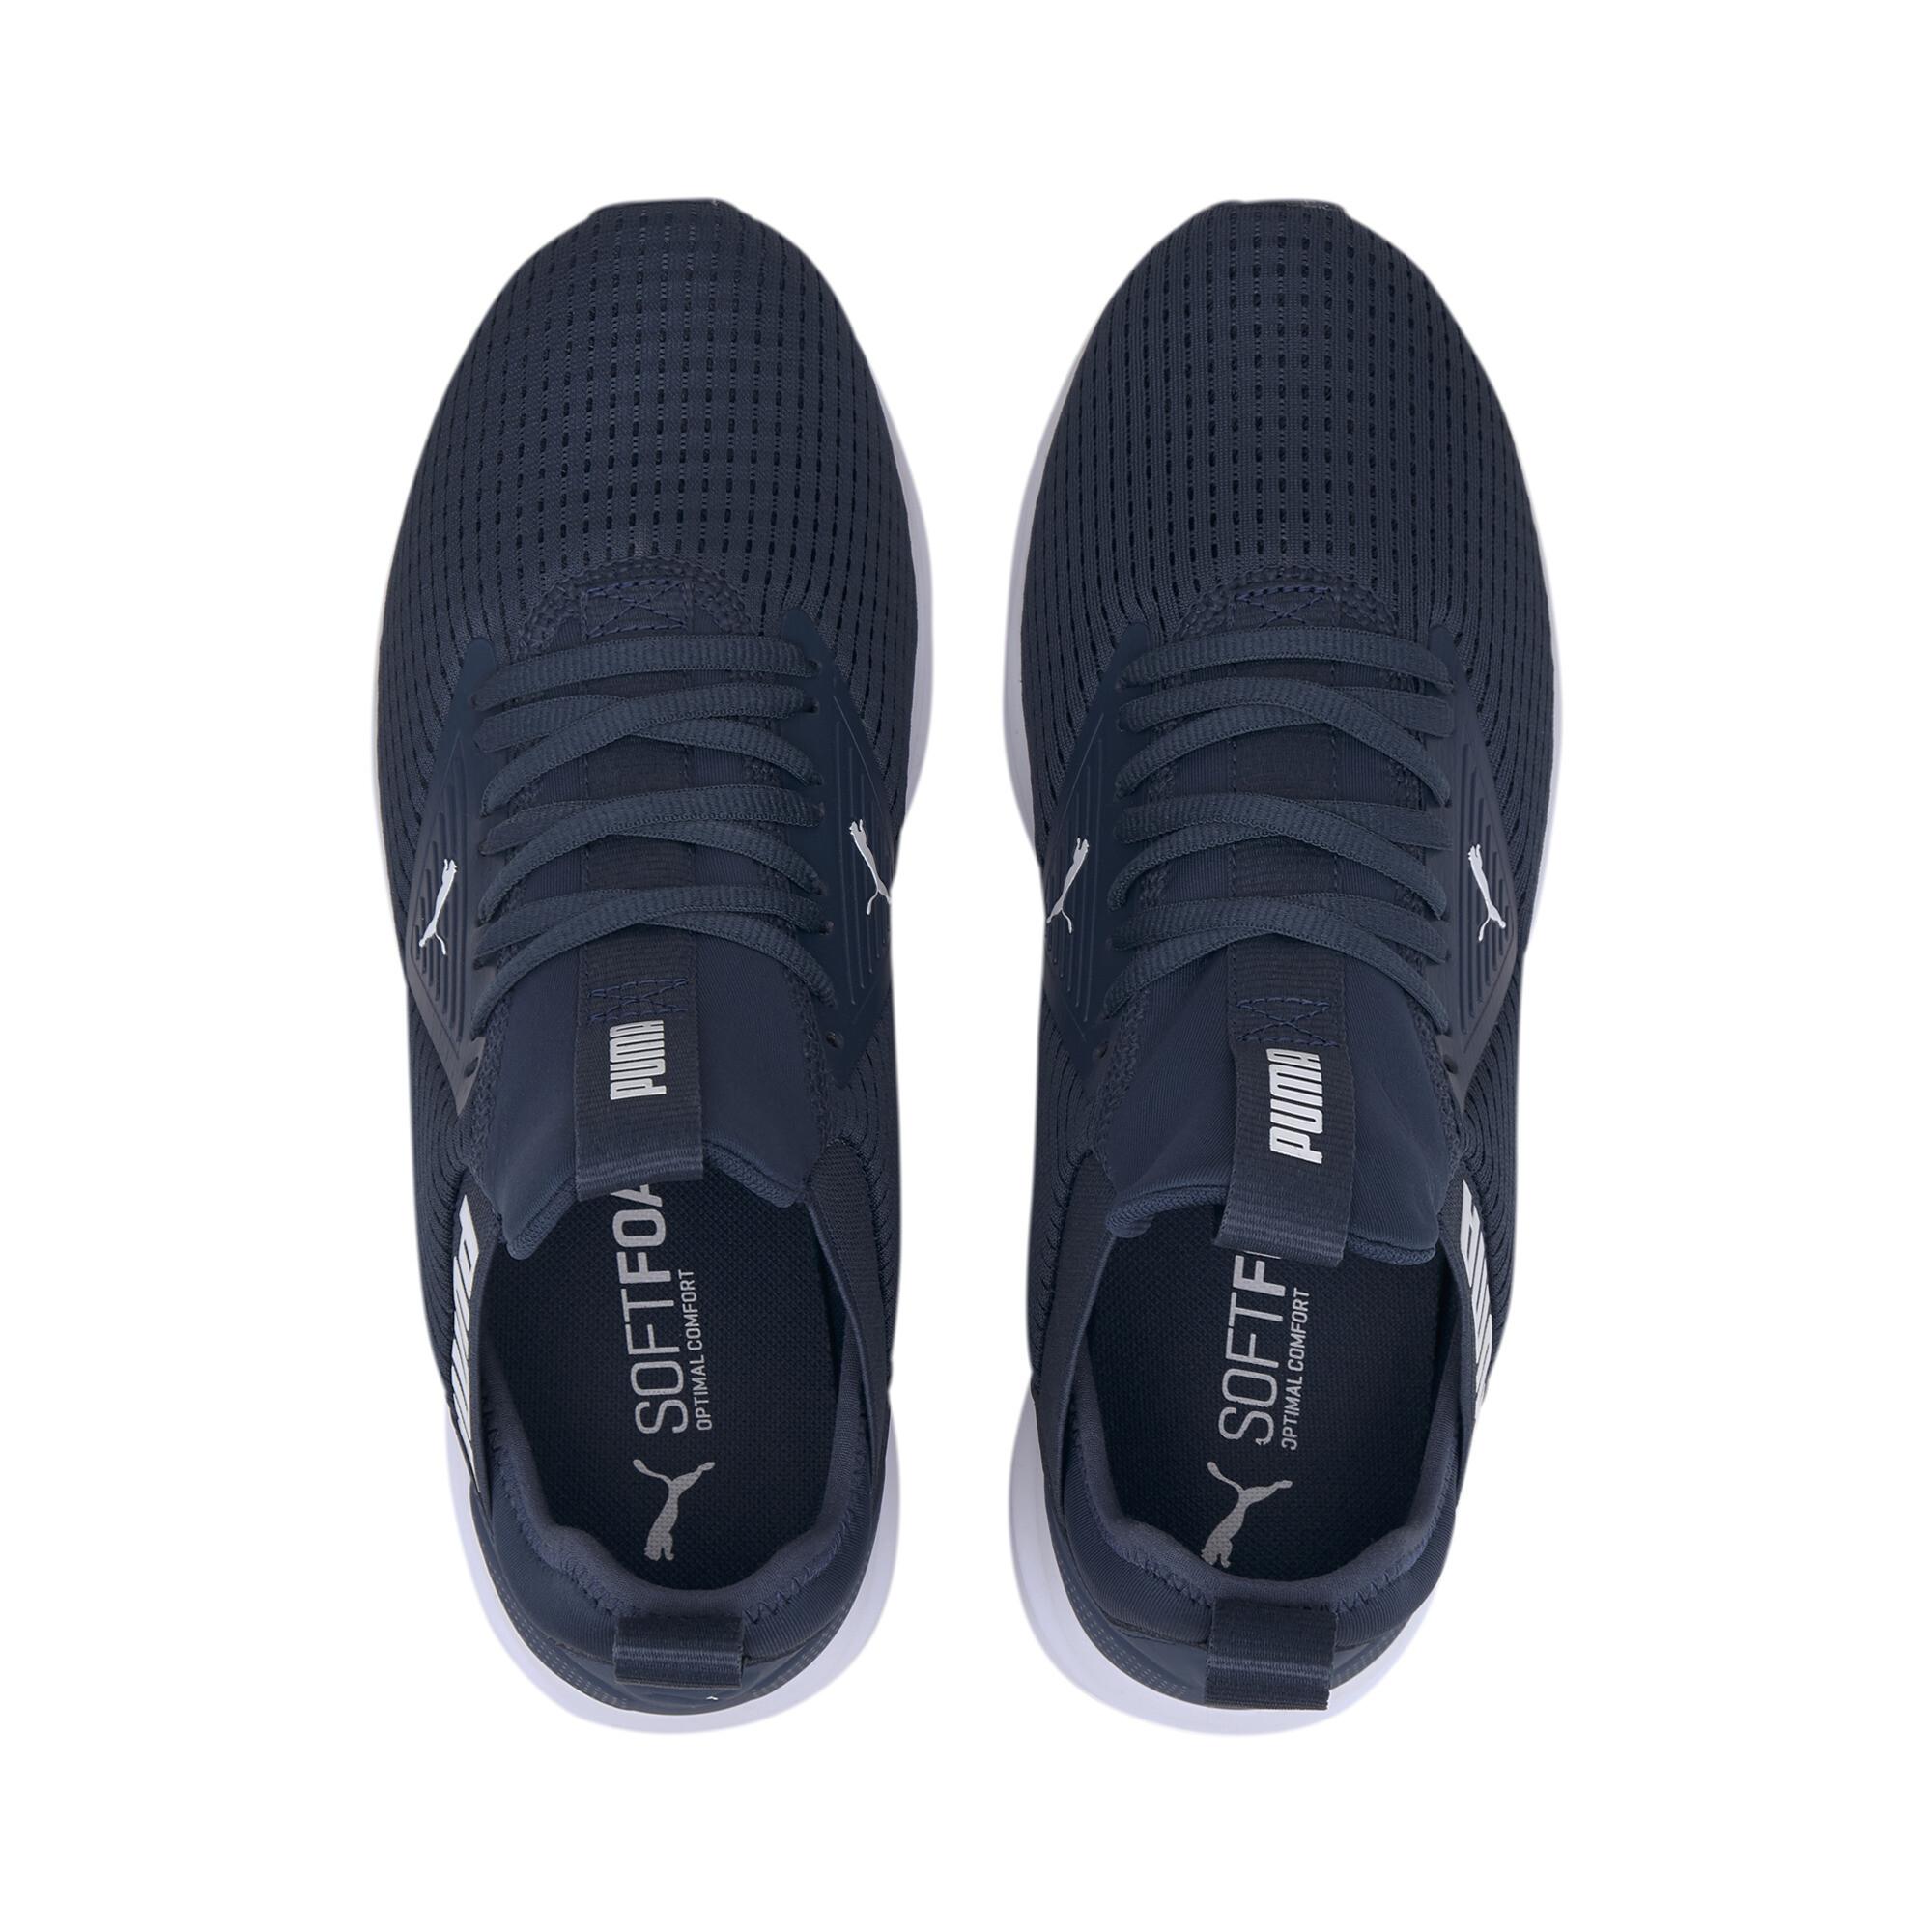 PUMA-Men-039-s-Enzo-Beta-Mesh-Training-Shoes thumbnail 22